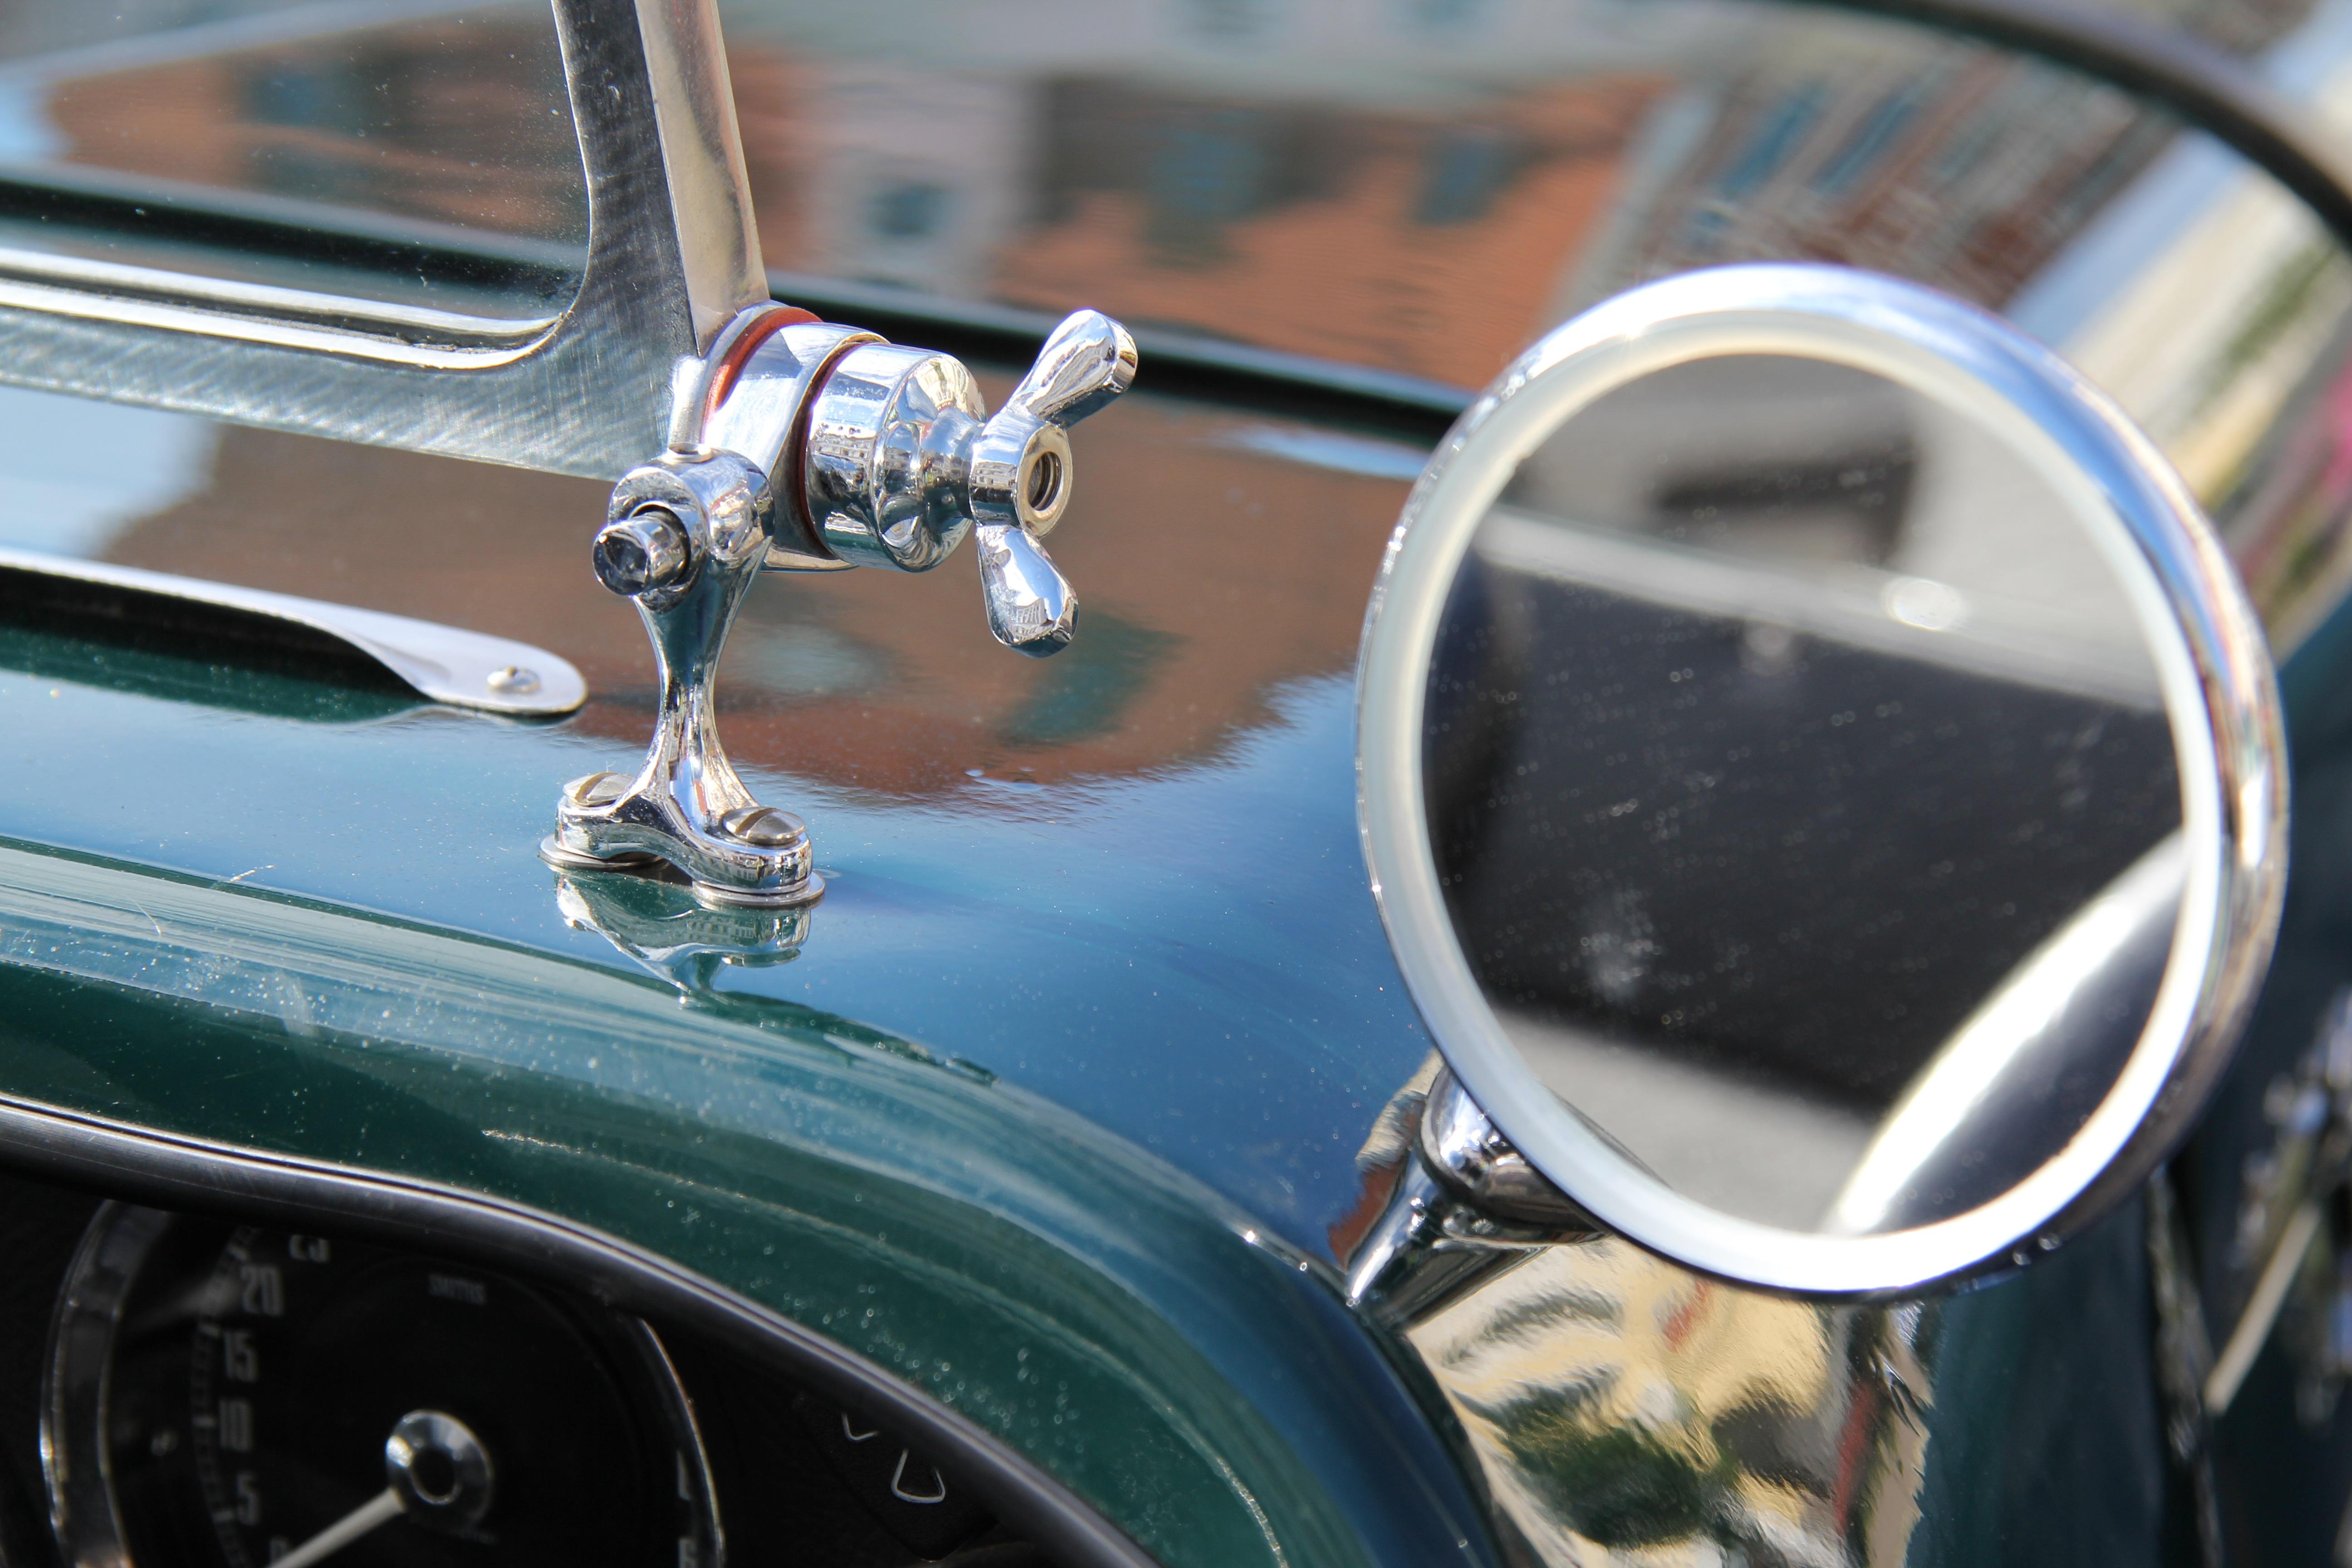 Free Images Wheel Glass Motorcycle Auto Motor Vehicle Vintage